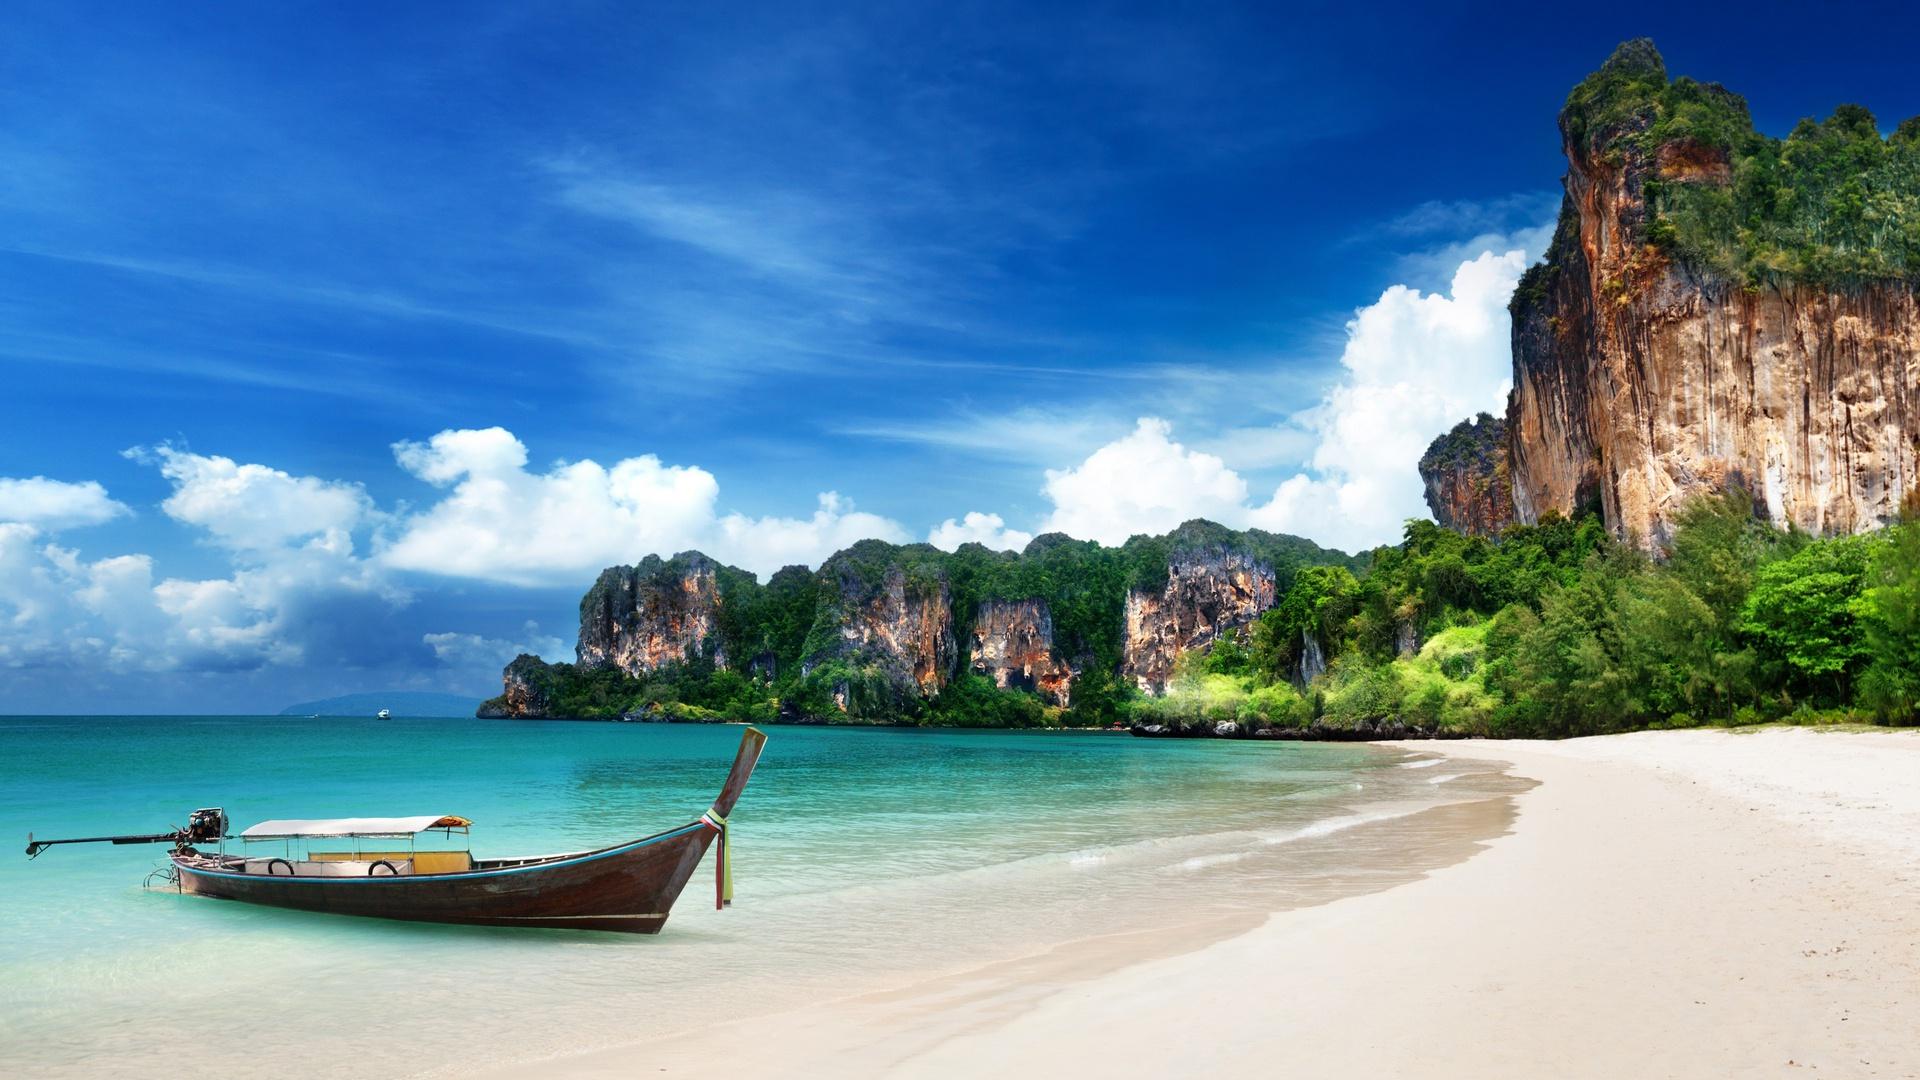 Krabi Island Beach Thailand Seashore... Wallpaper #13759